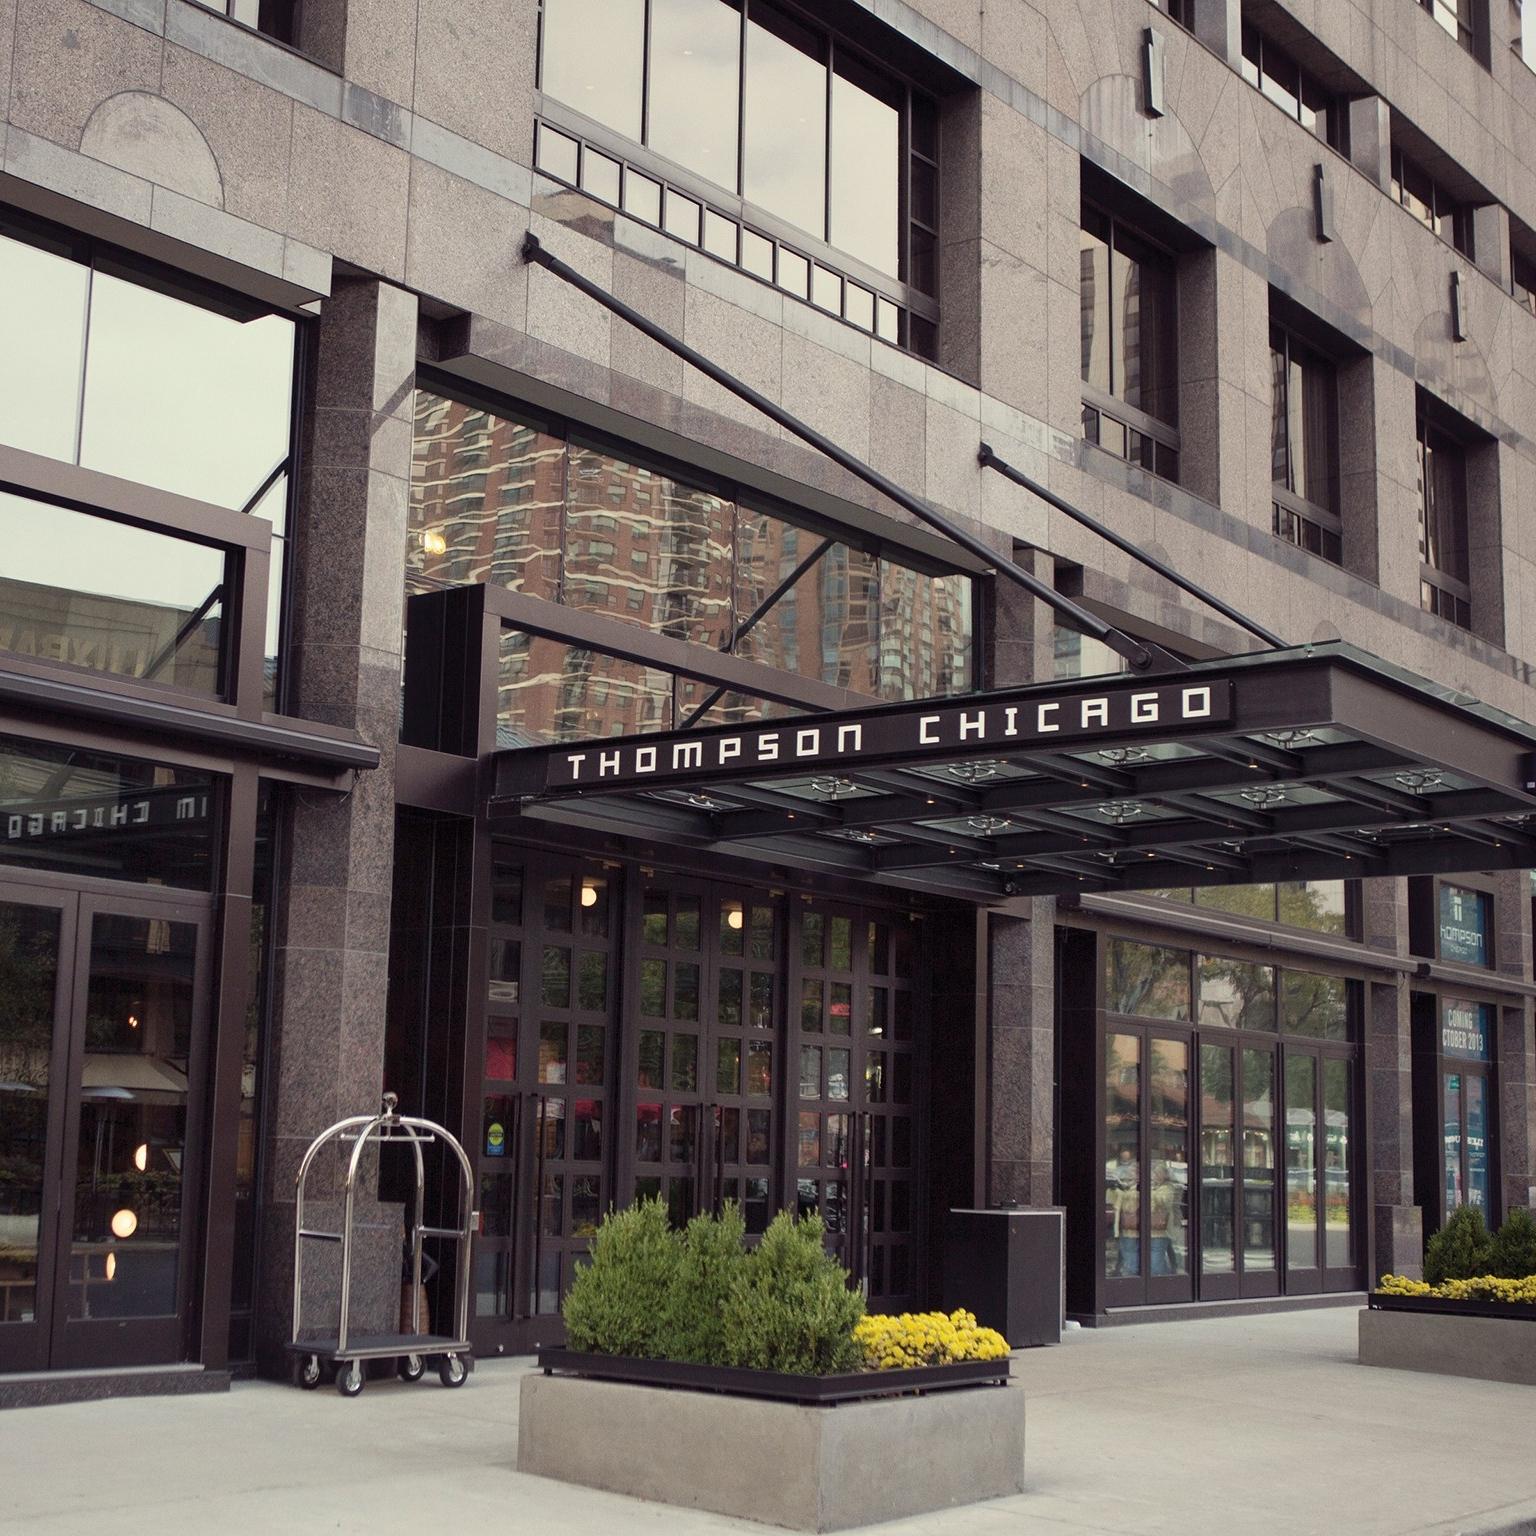 Exterior-ThompsonChicago-ChicagoIL-CRHotel.jpg